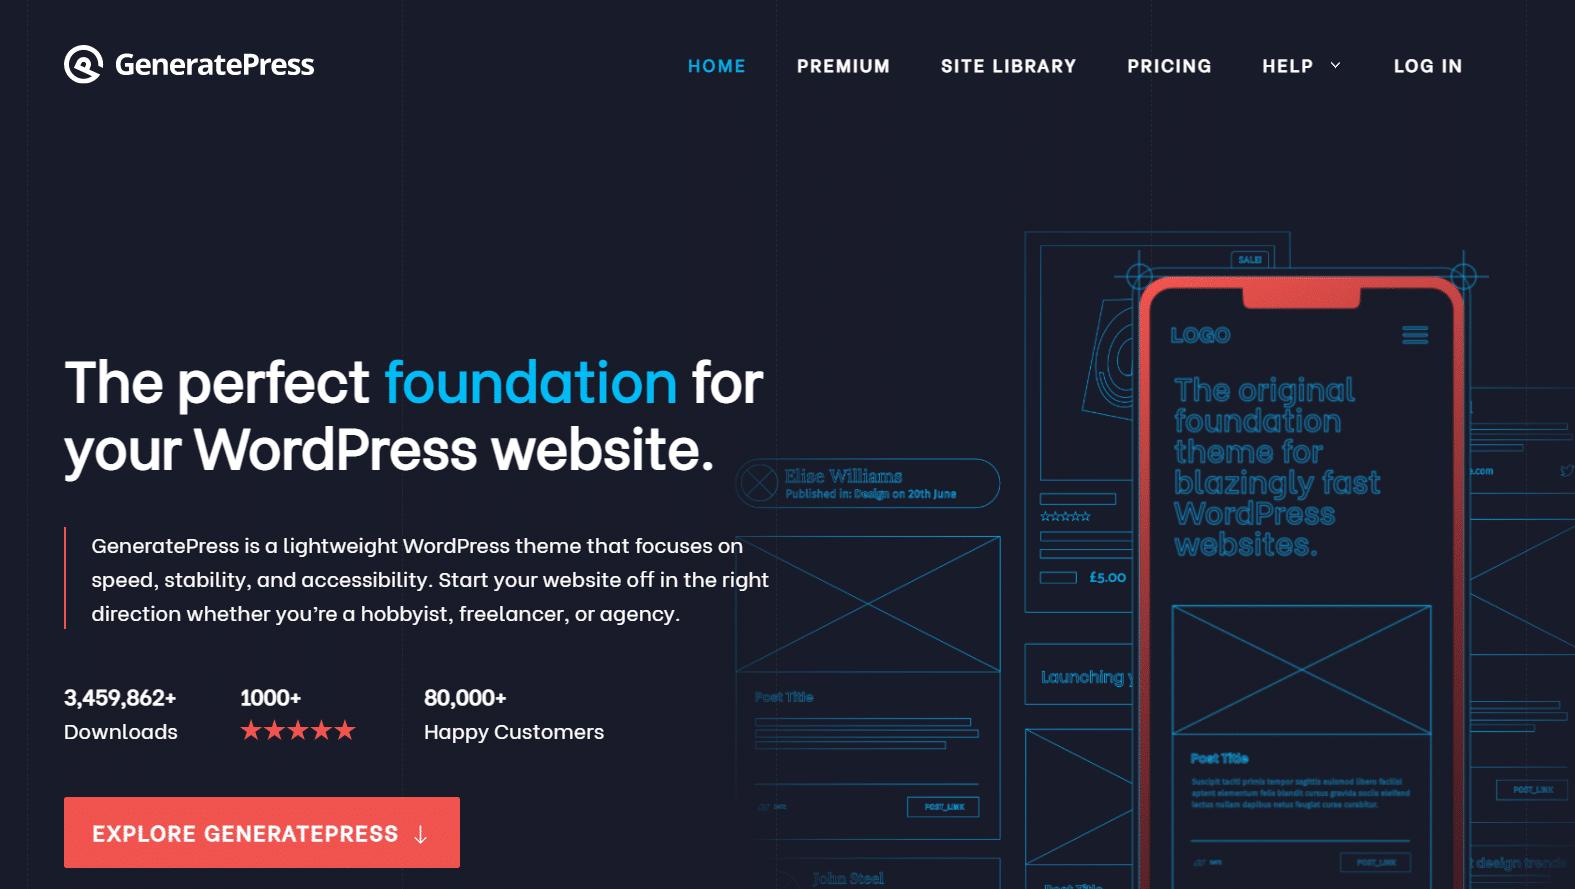 GeneratePress Free vs Premium